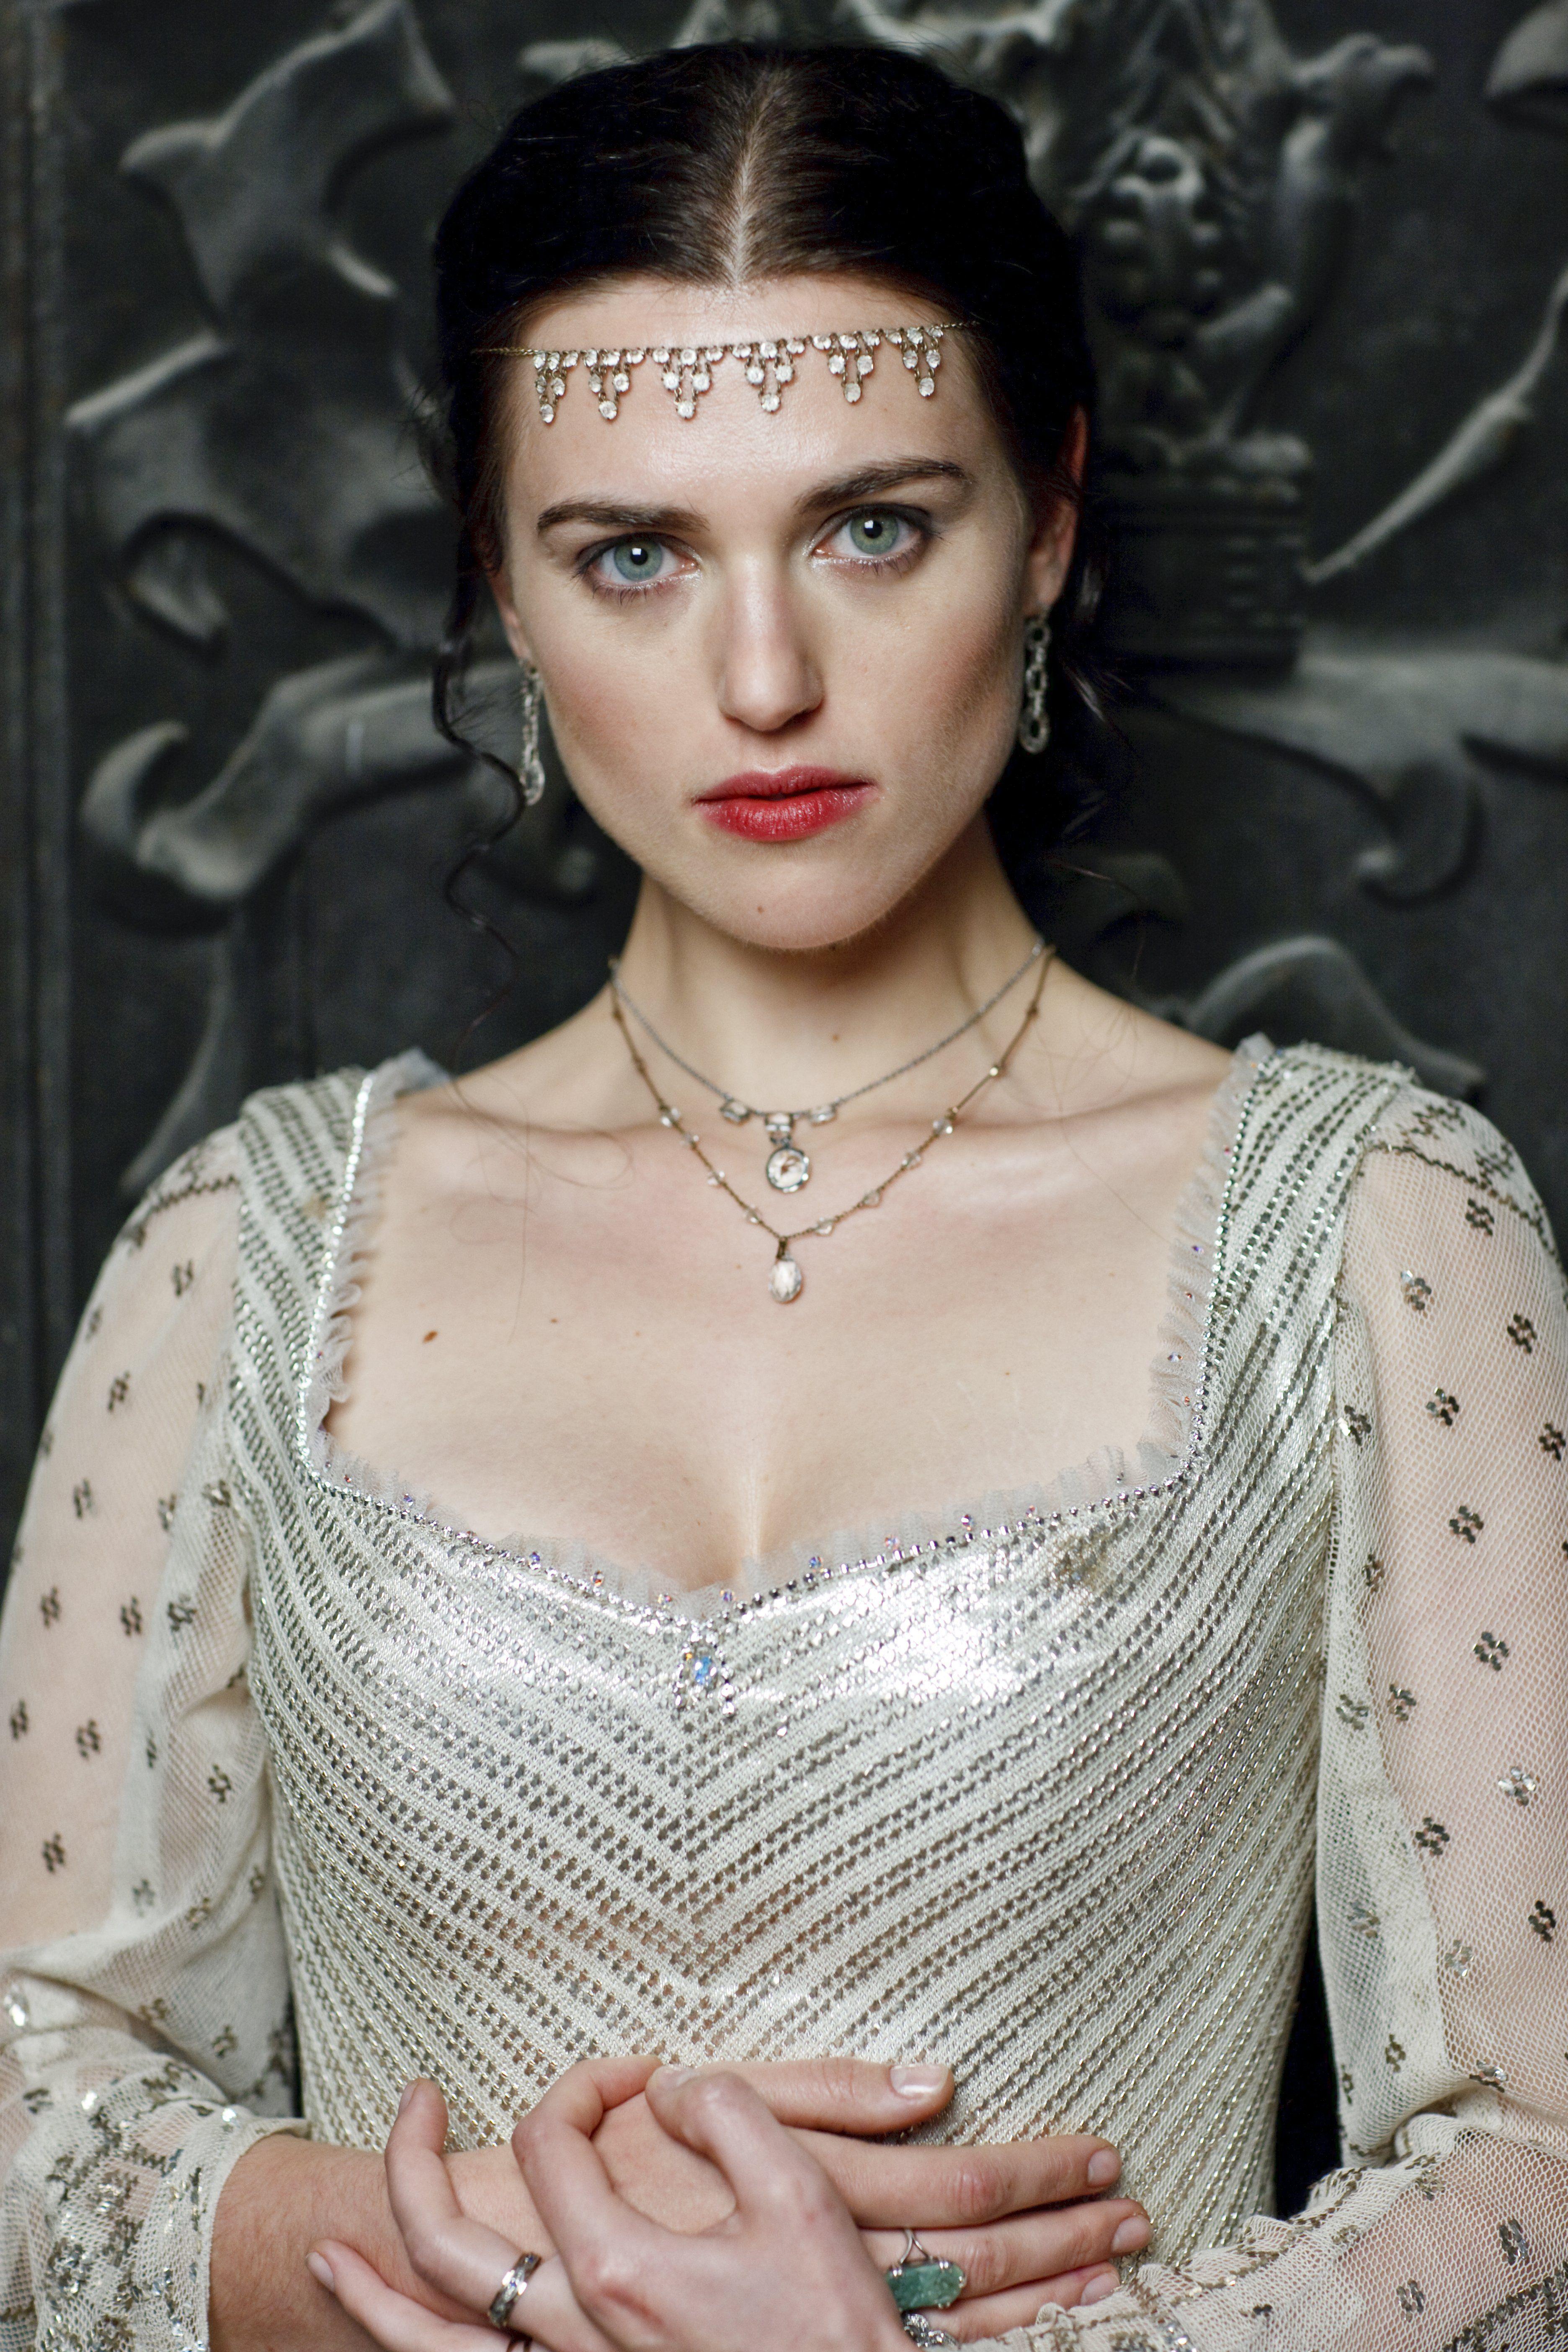 Merlin S2 Katie McGrath as Morgana | Katie mcgrath